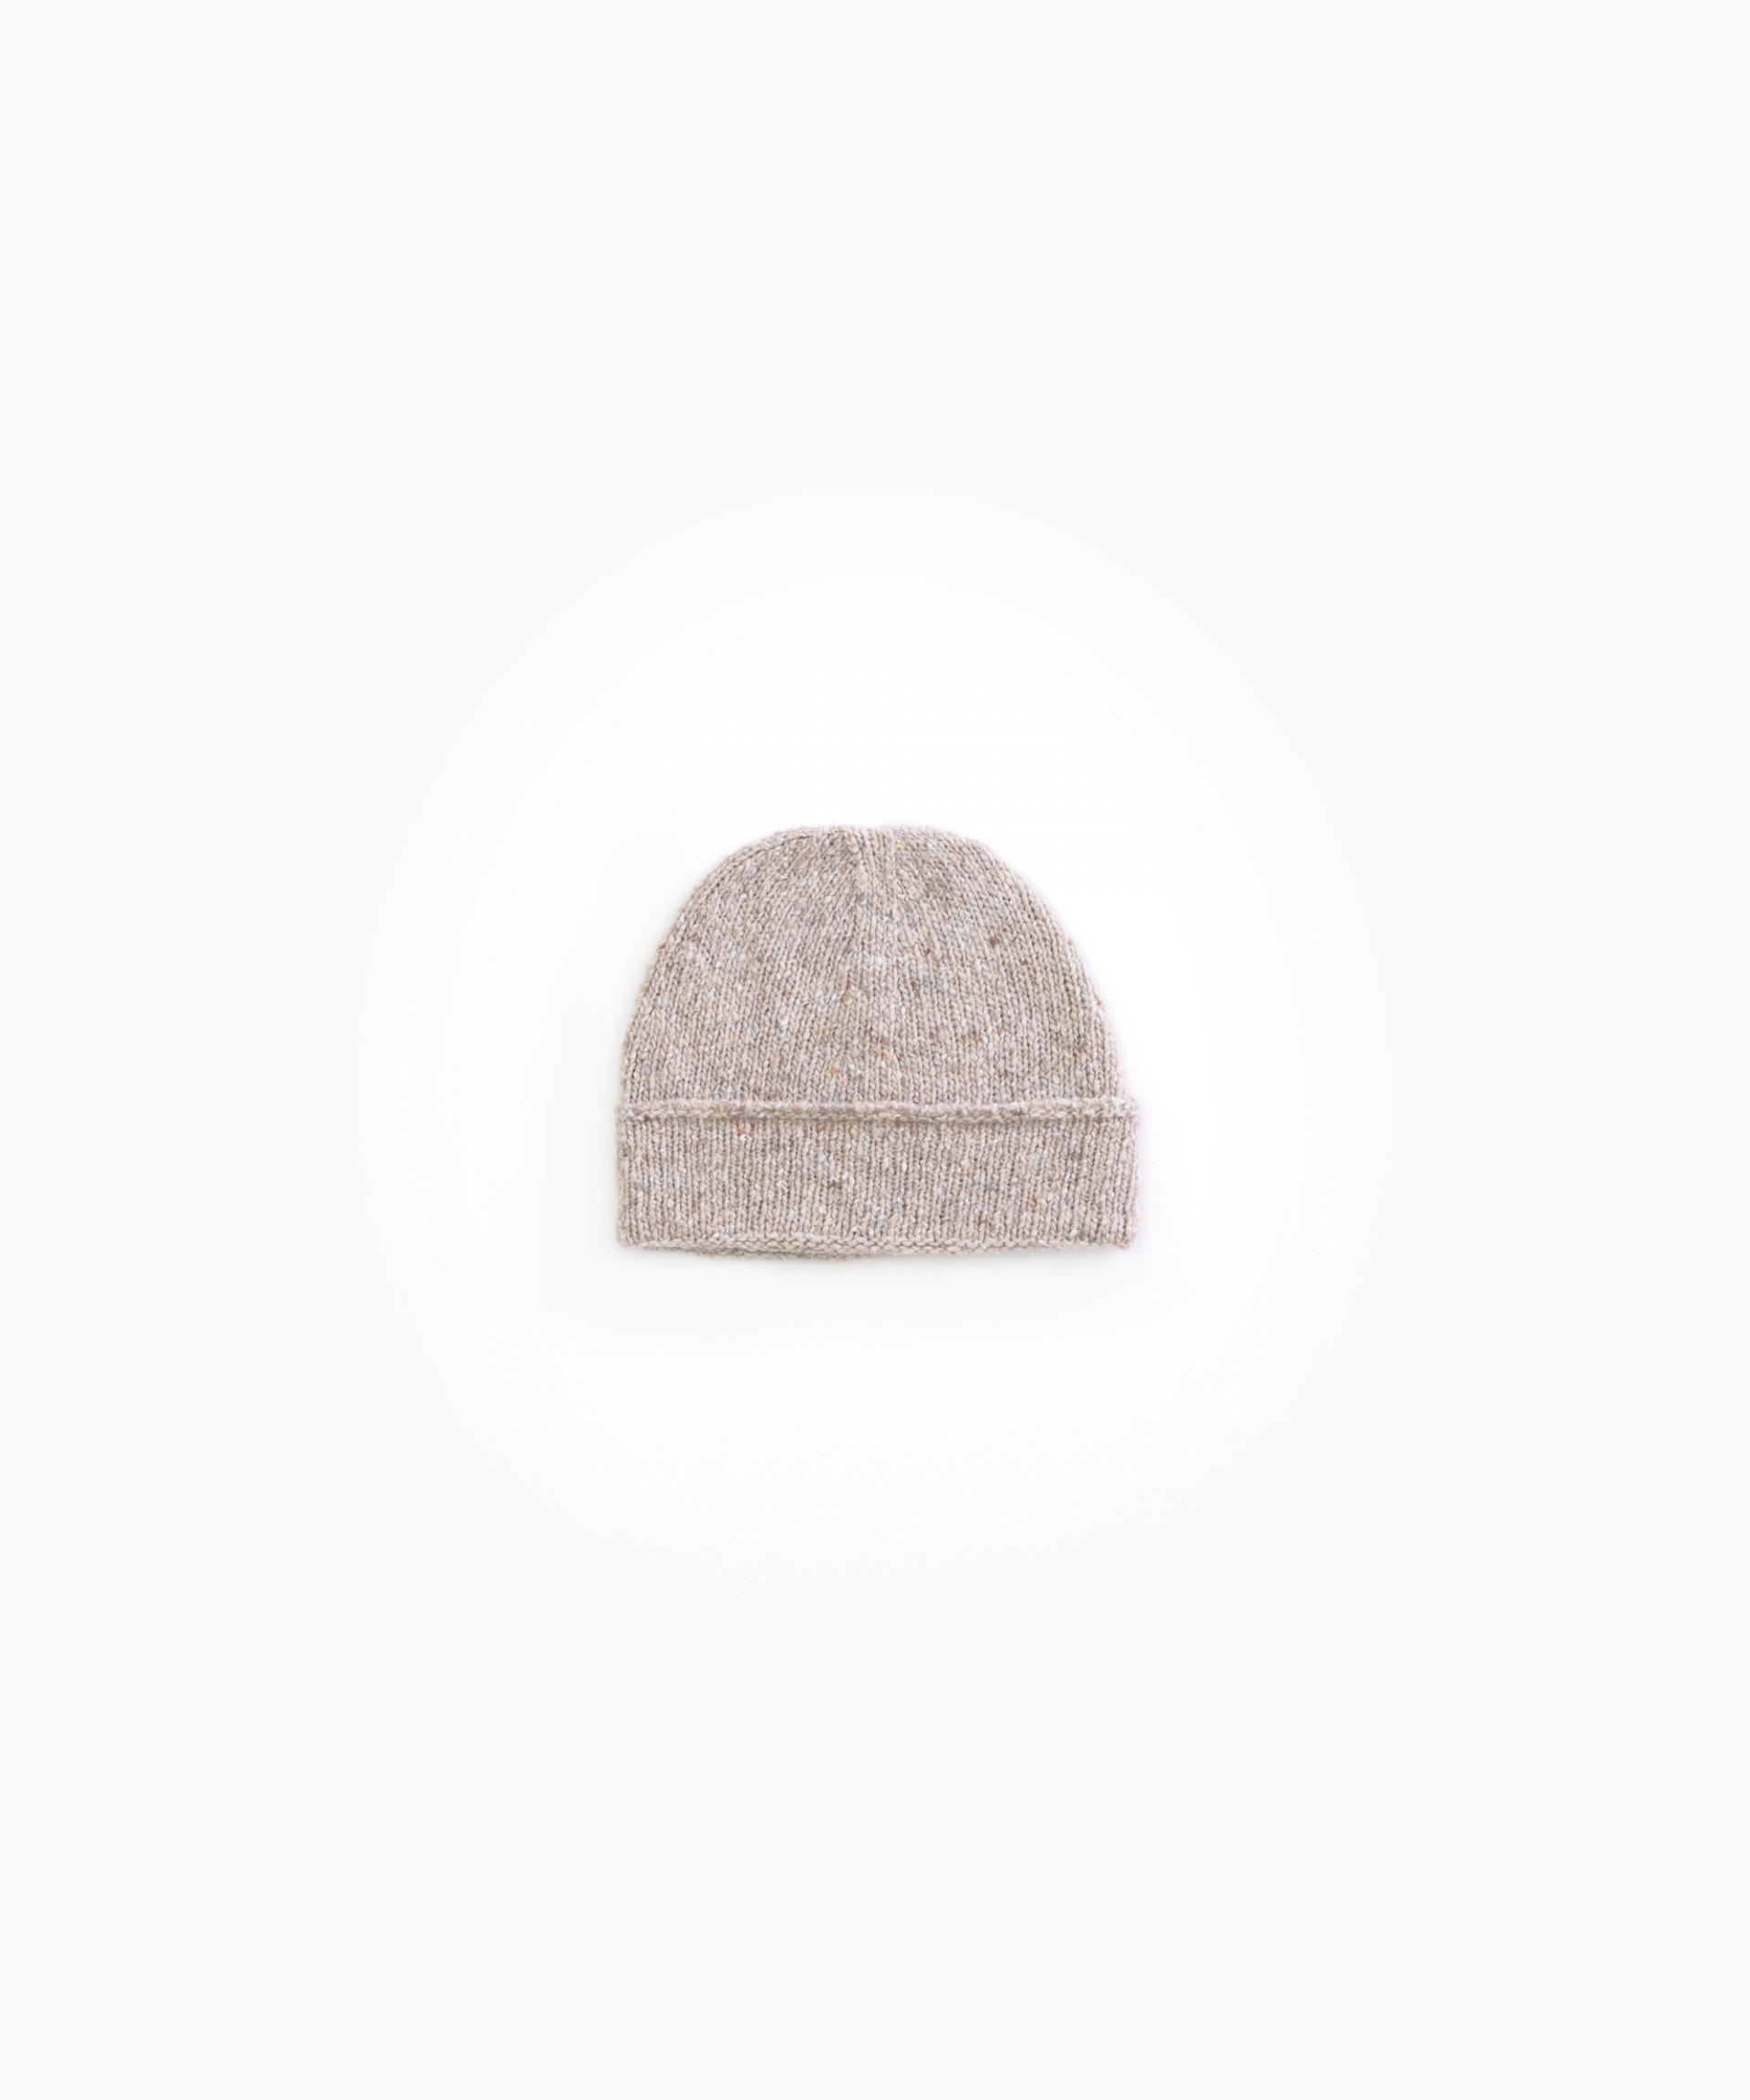 Gorro tricot | Woodwork